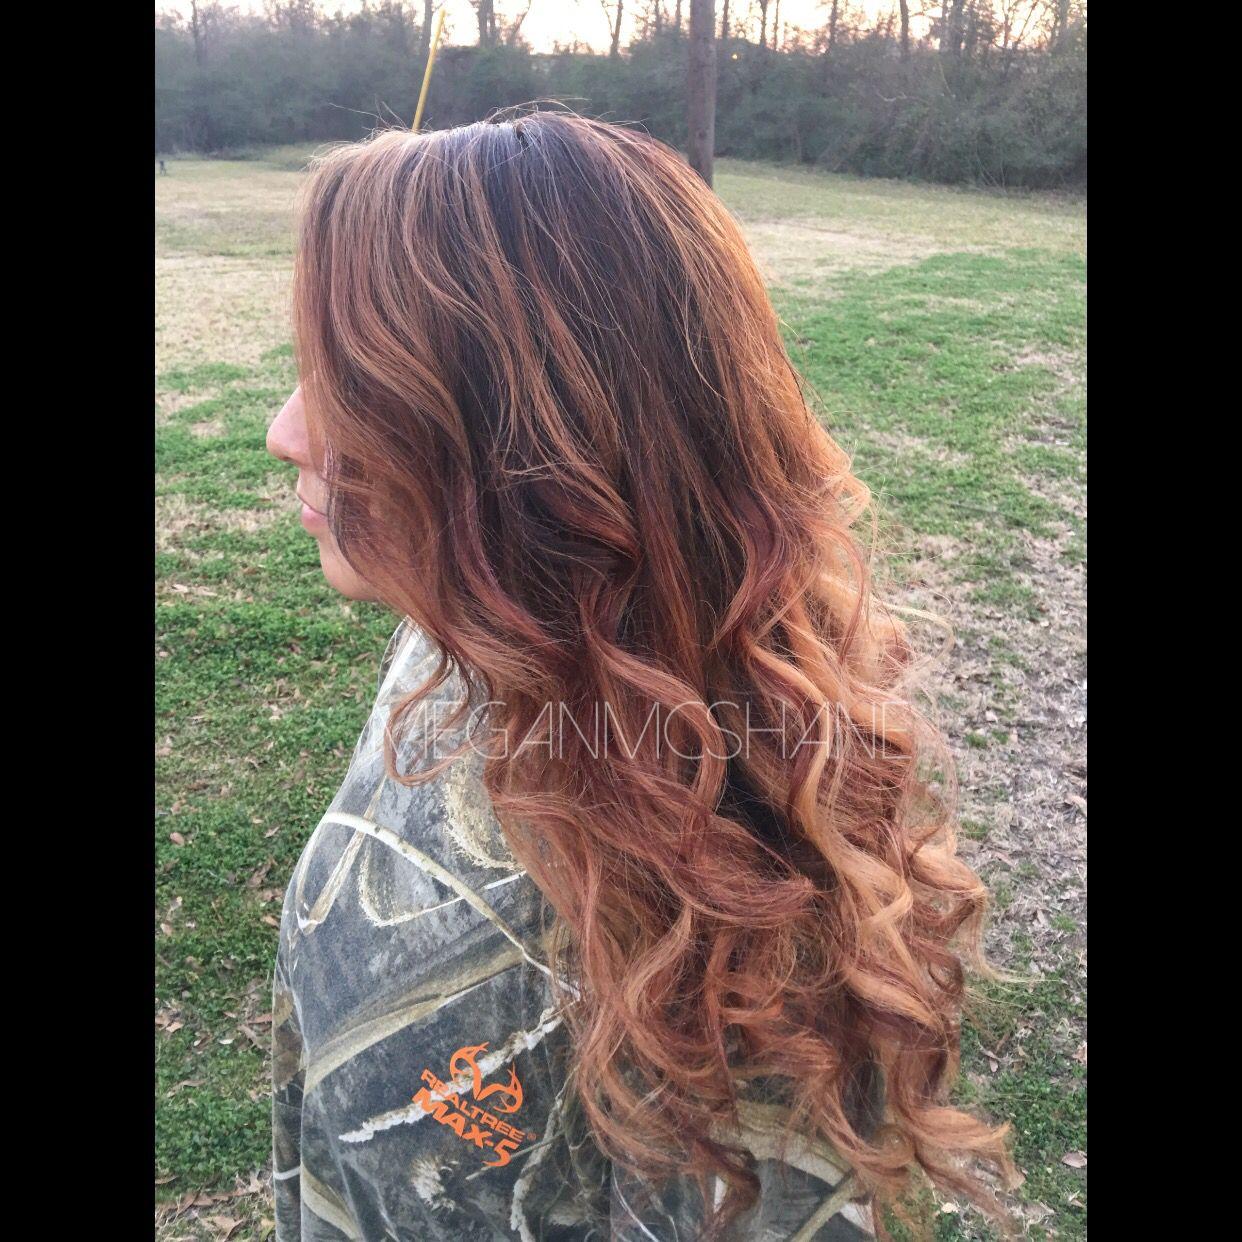 Hair By Megan Mcshane Ombre Caramel Ombre Ombre Hair Highlights